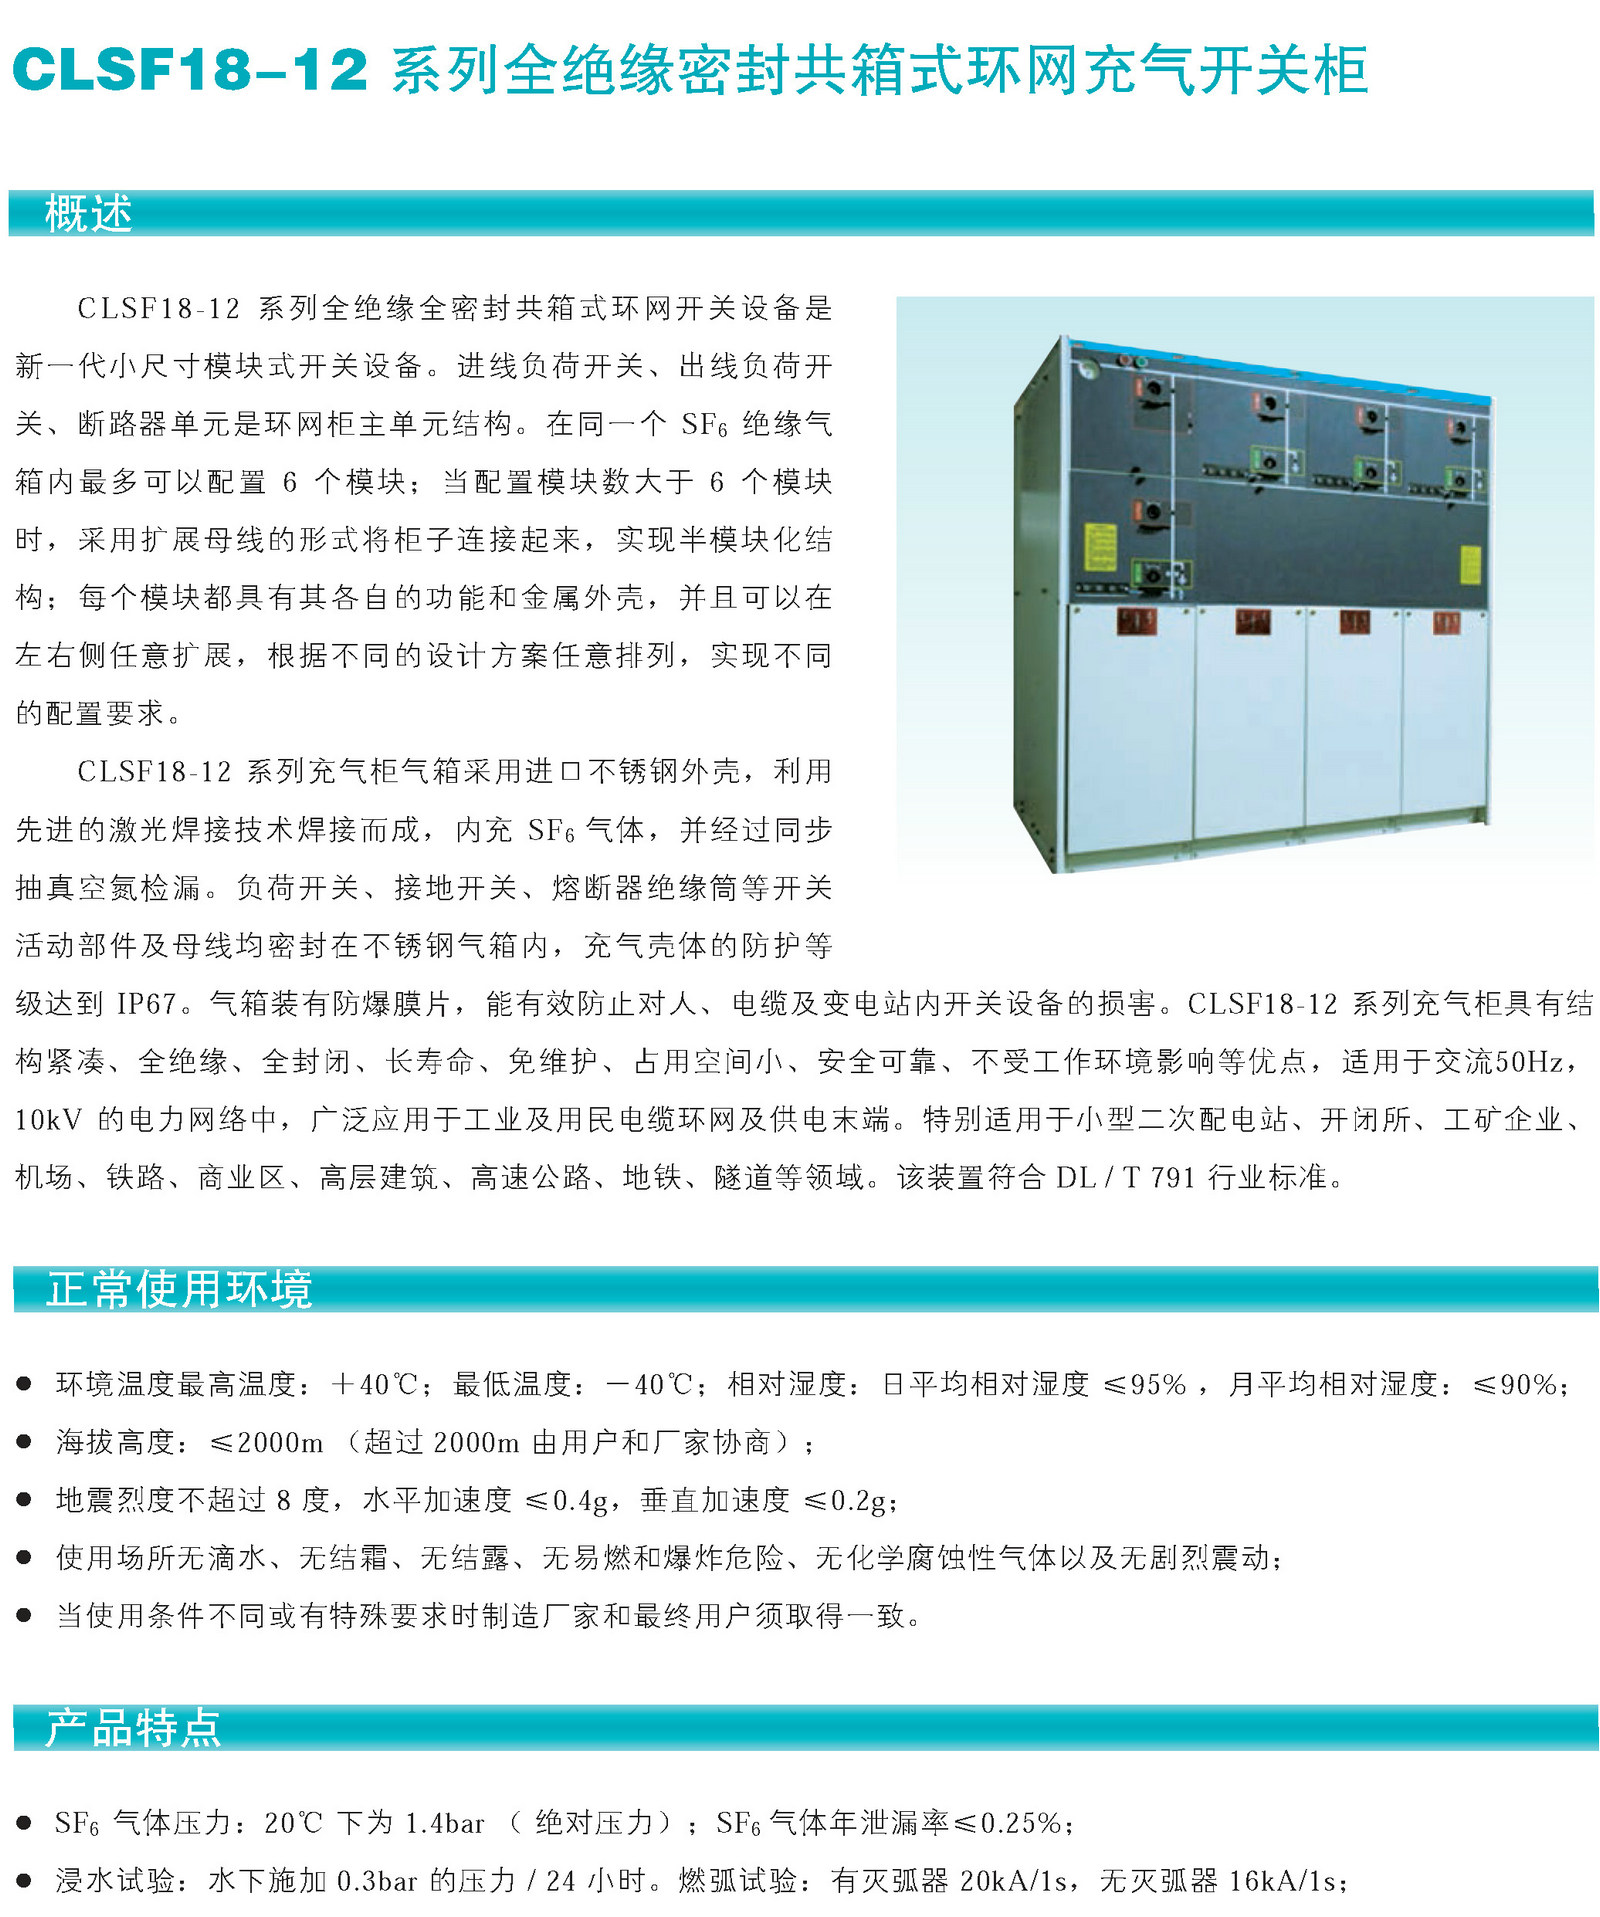 CLSF18密封共箱充气环网柜1副本